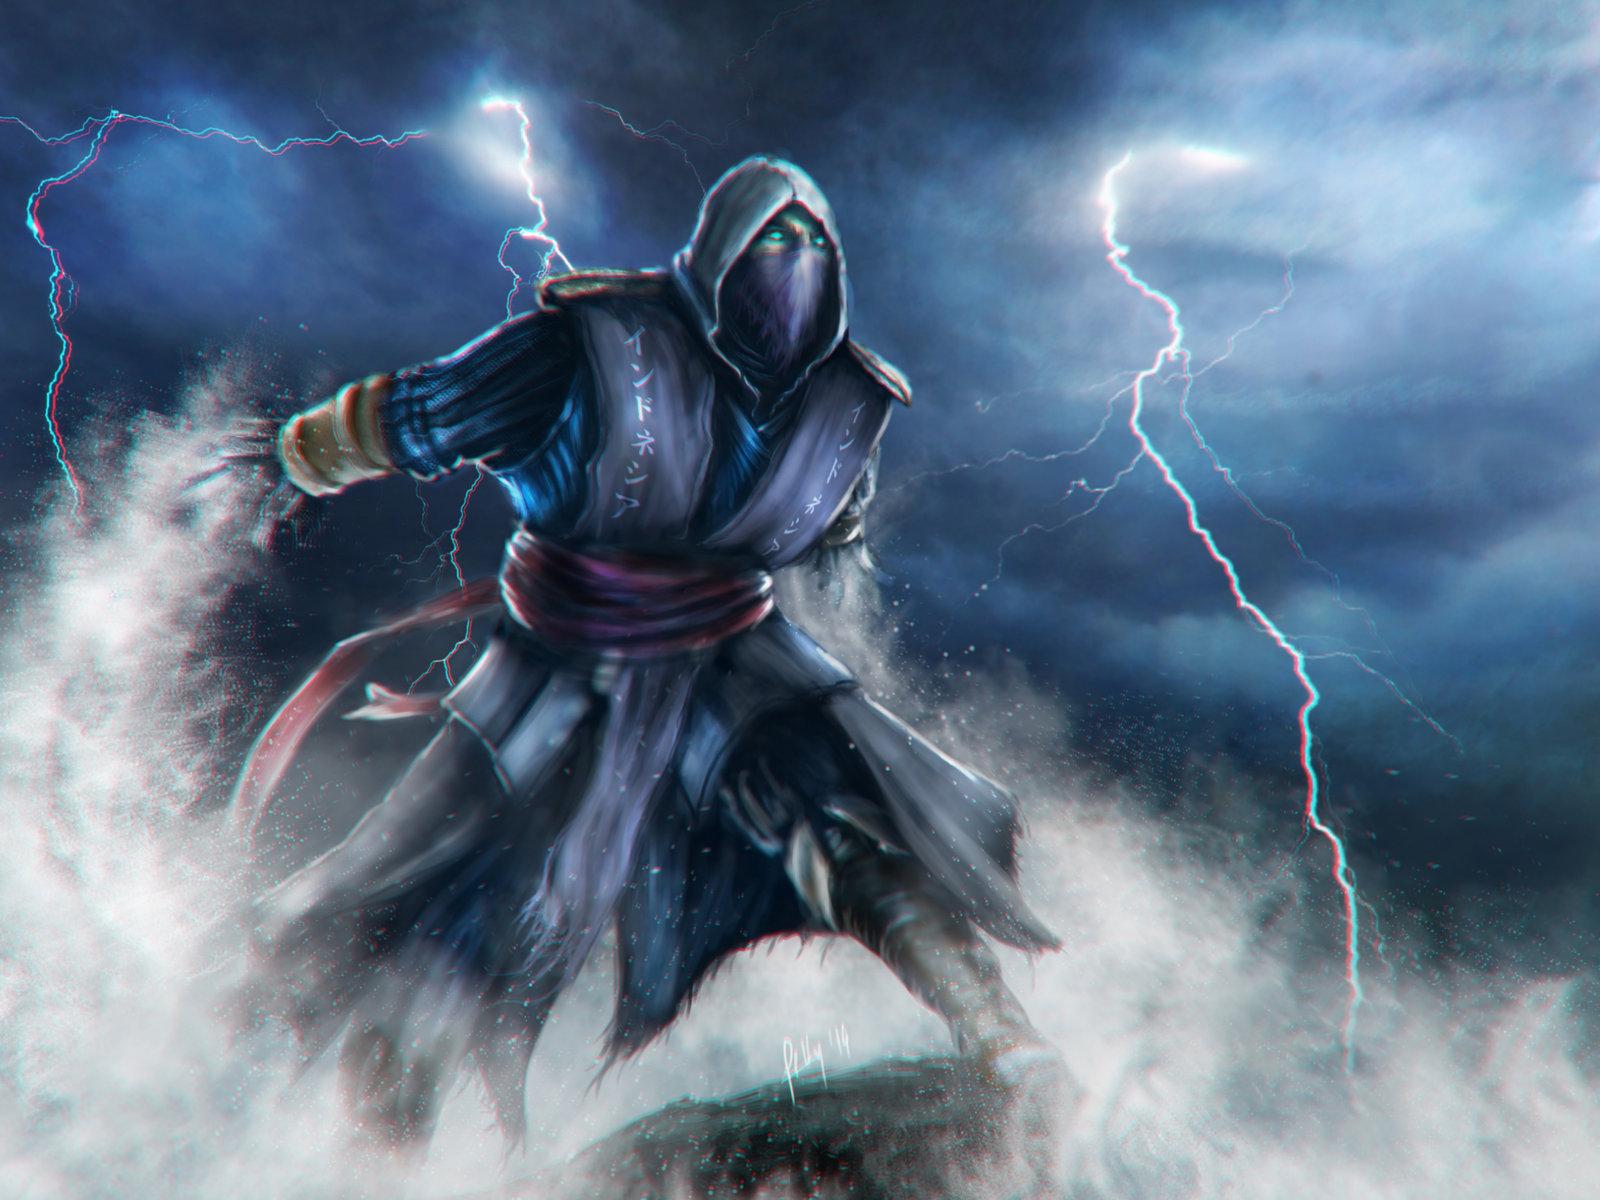 Mortal Kombat Rain Wallpaper Mkac rain by letticiamaer 1600x1200